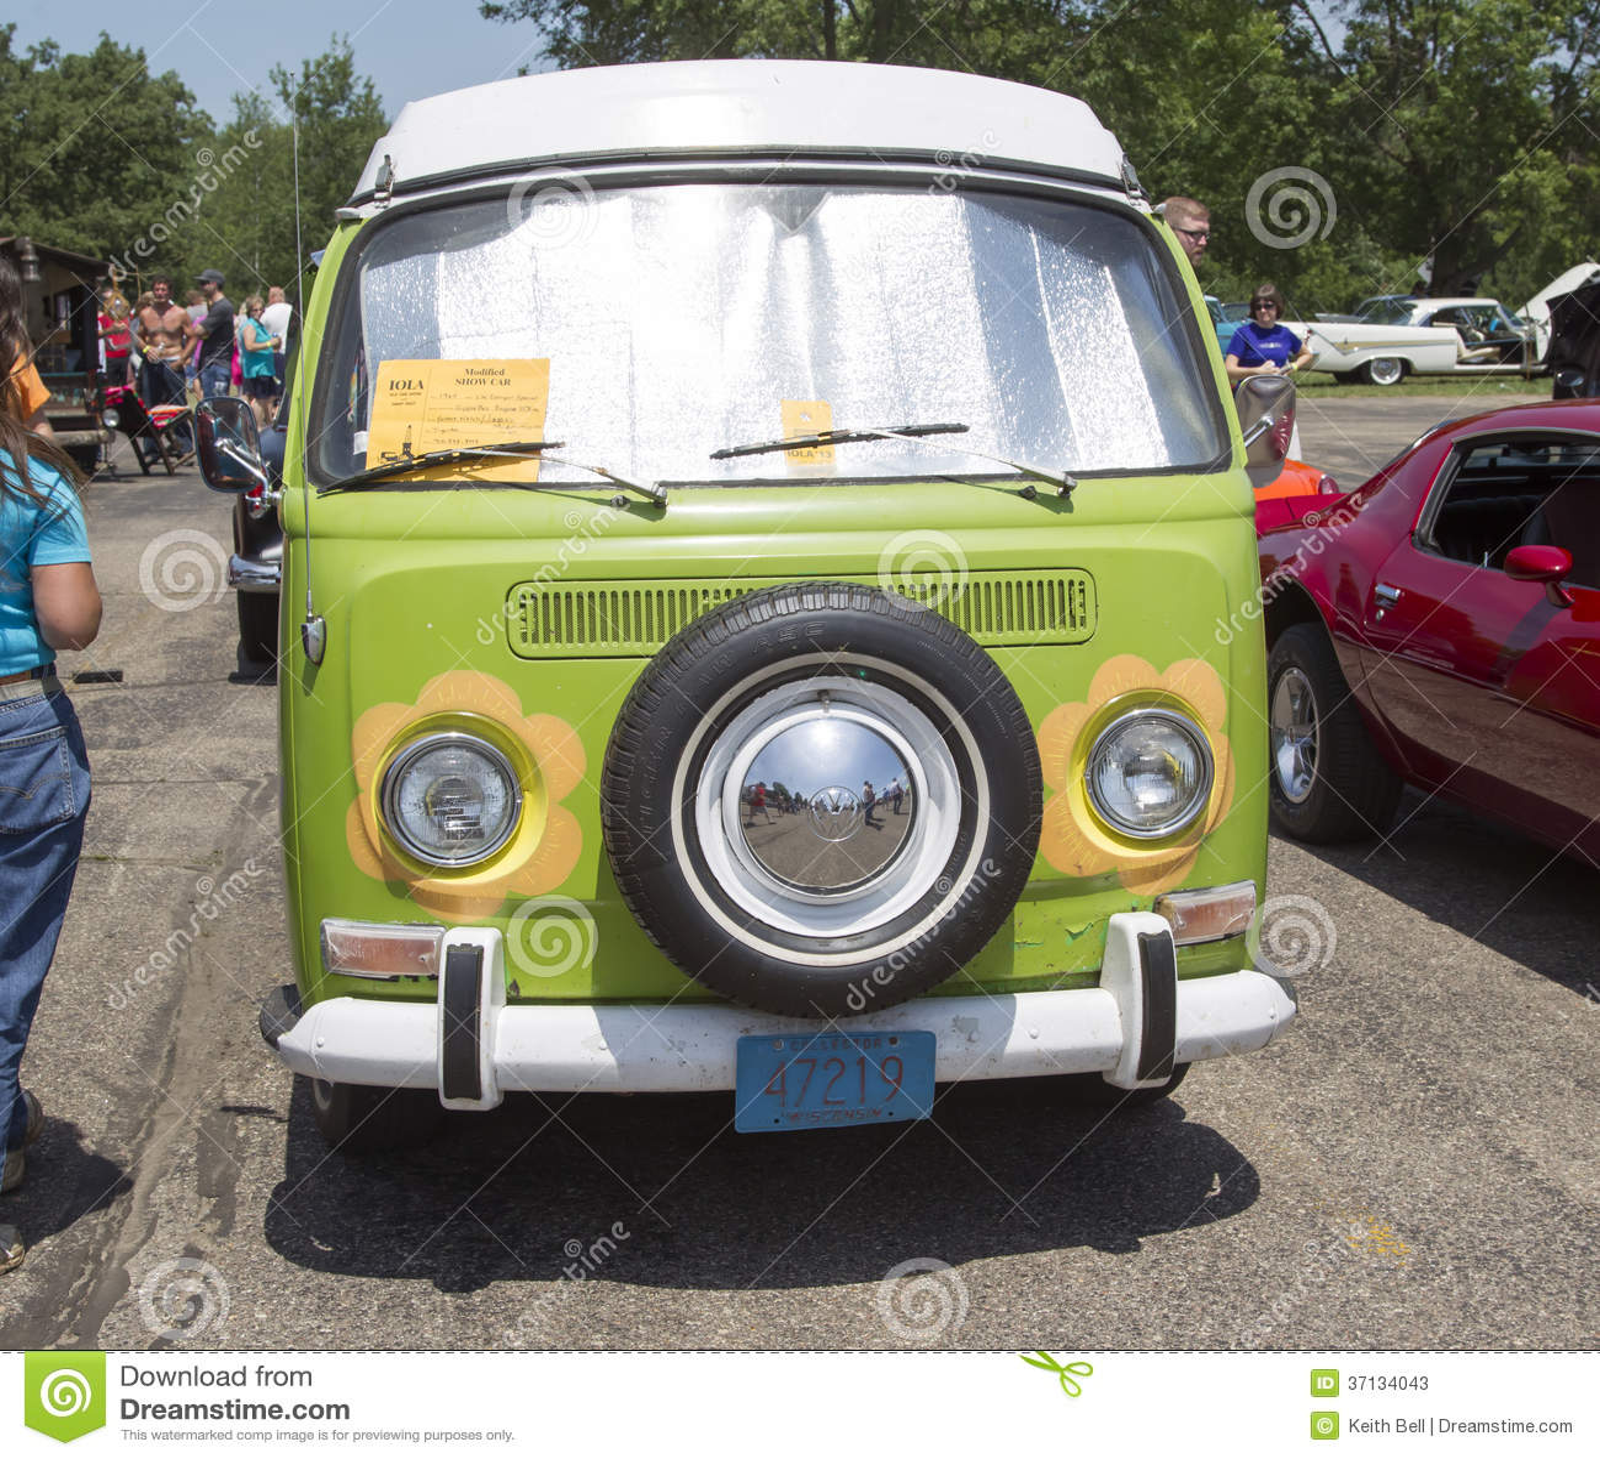 1968 Vw Hippie Camper Special Van Front View Editorial